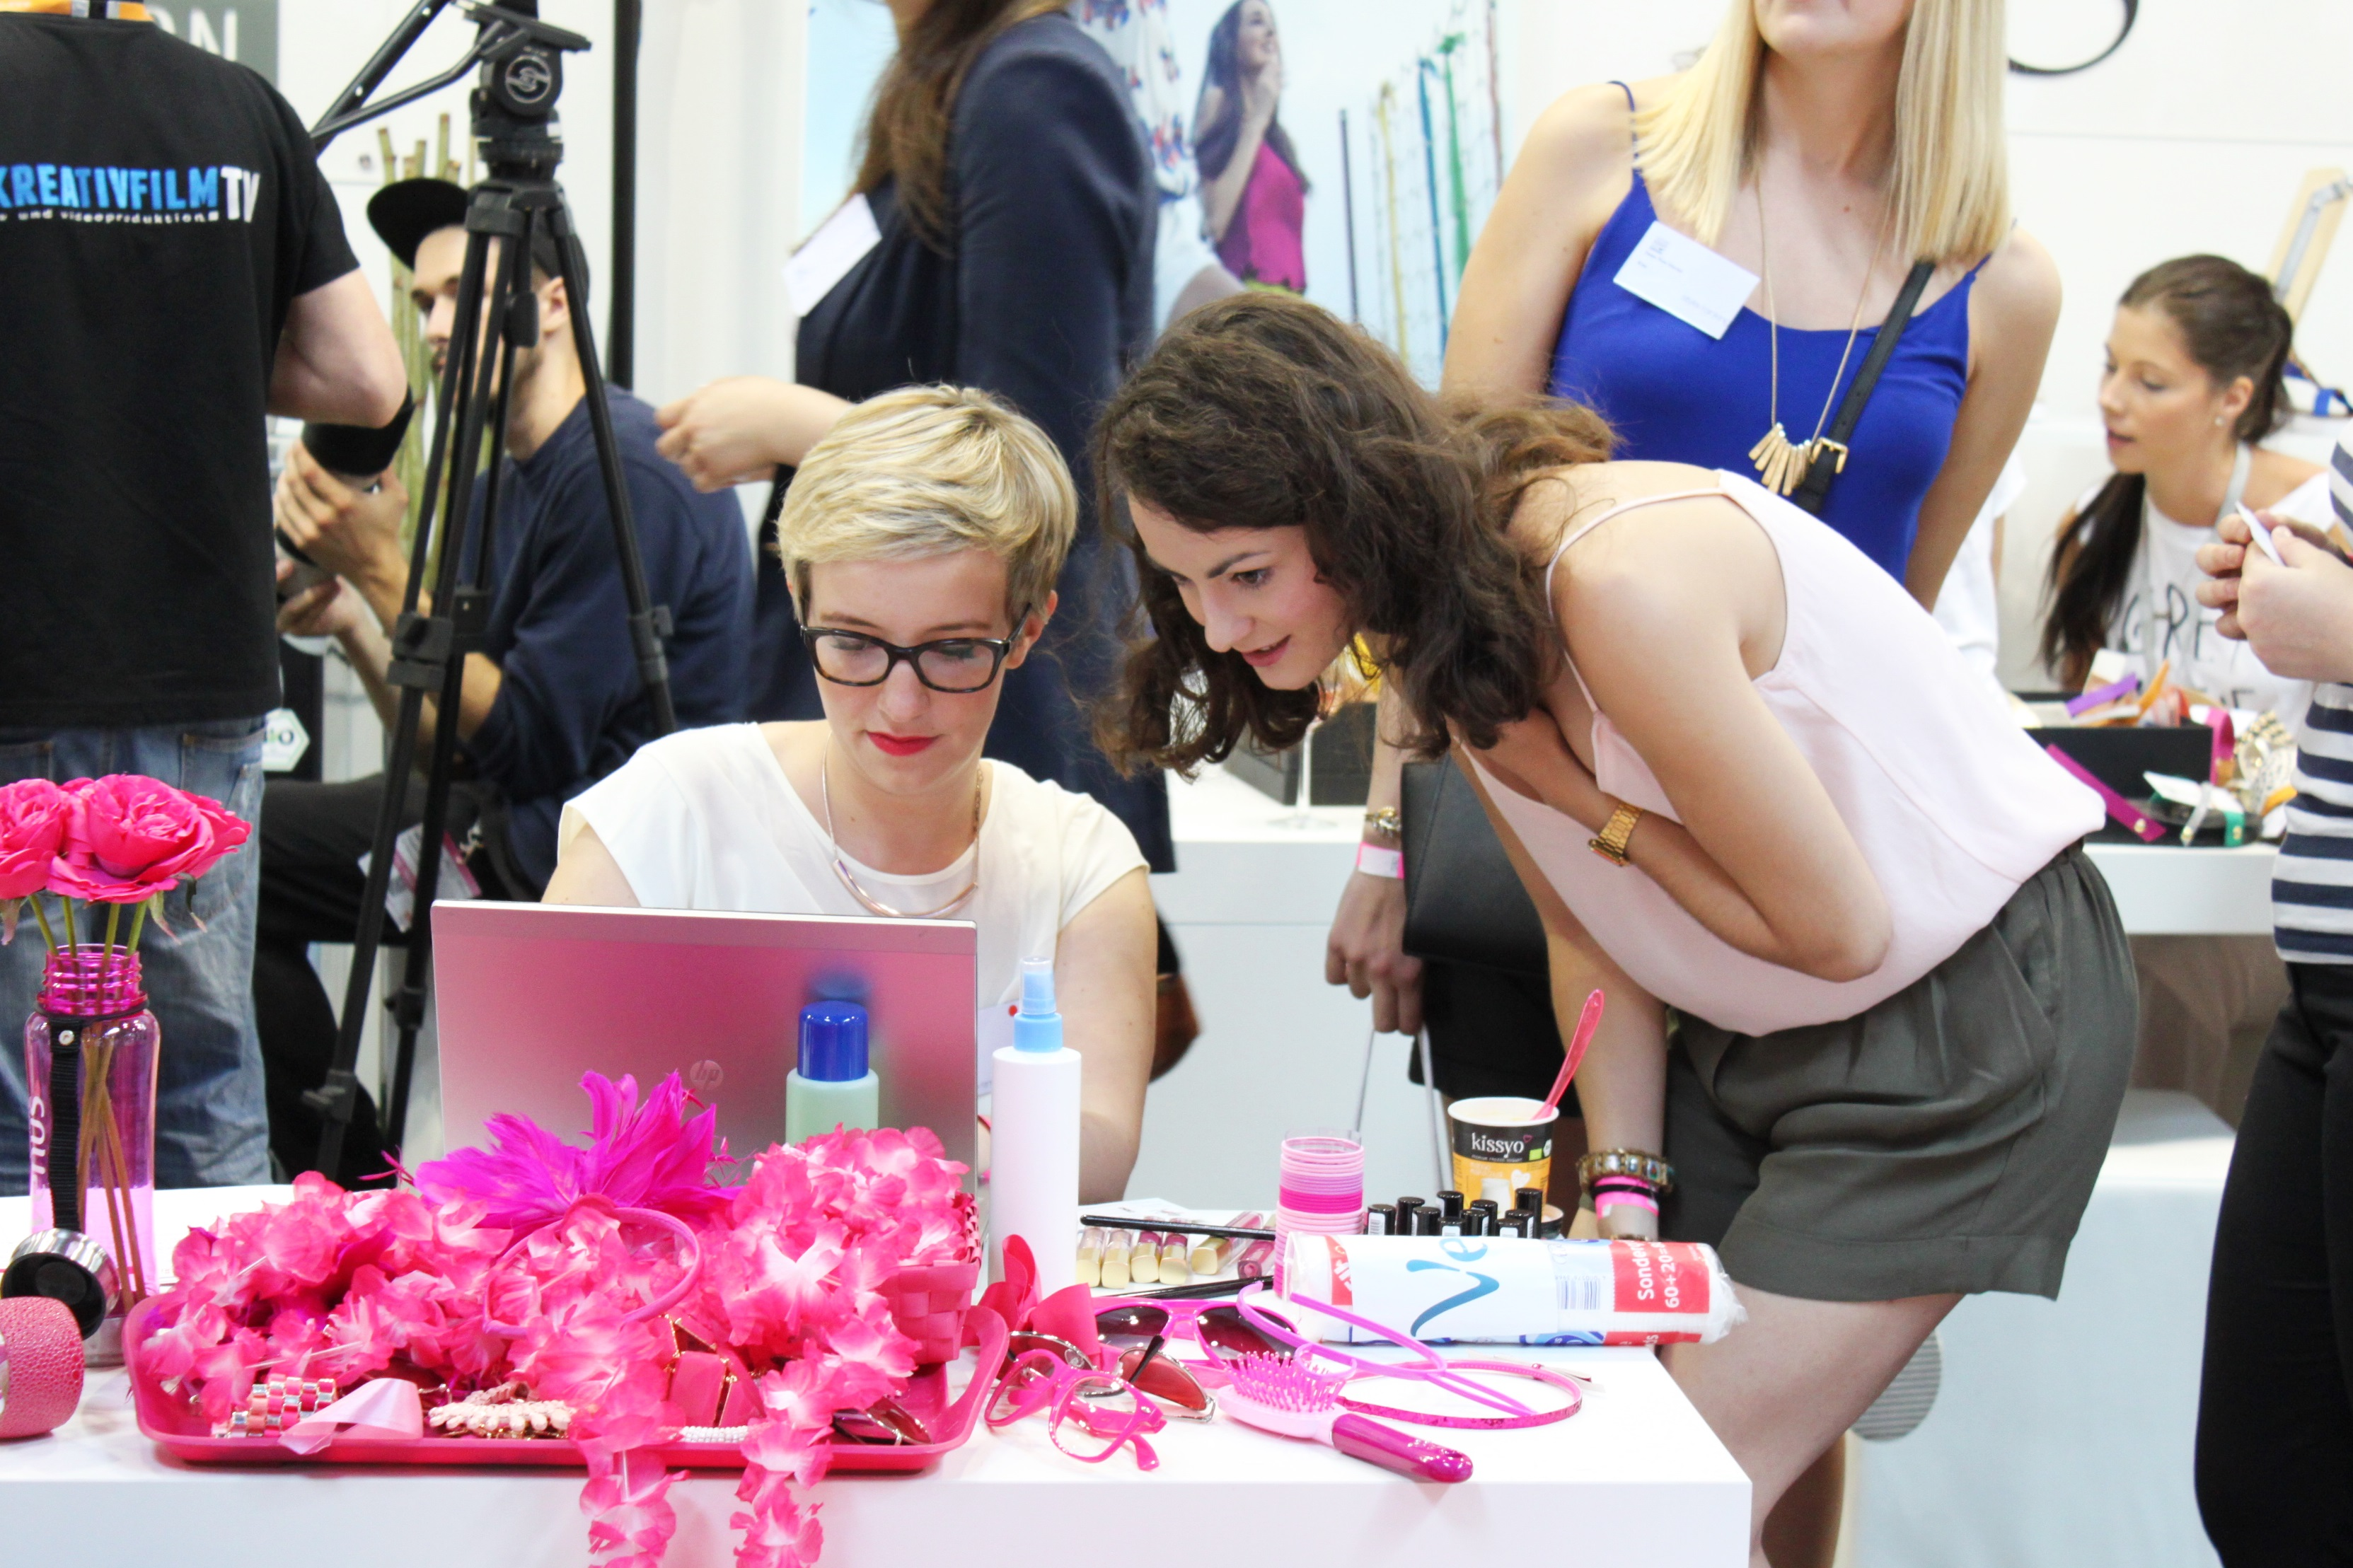 FashionBloggerCafé 2.0: GDS lädt modebegeisterte Blogger ein